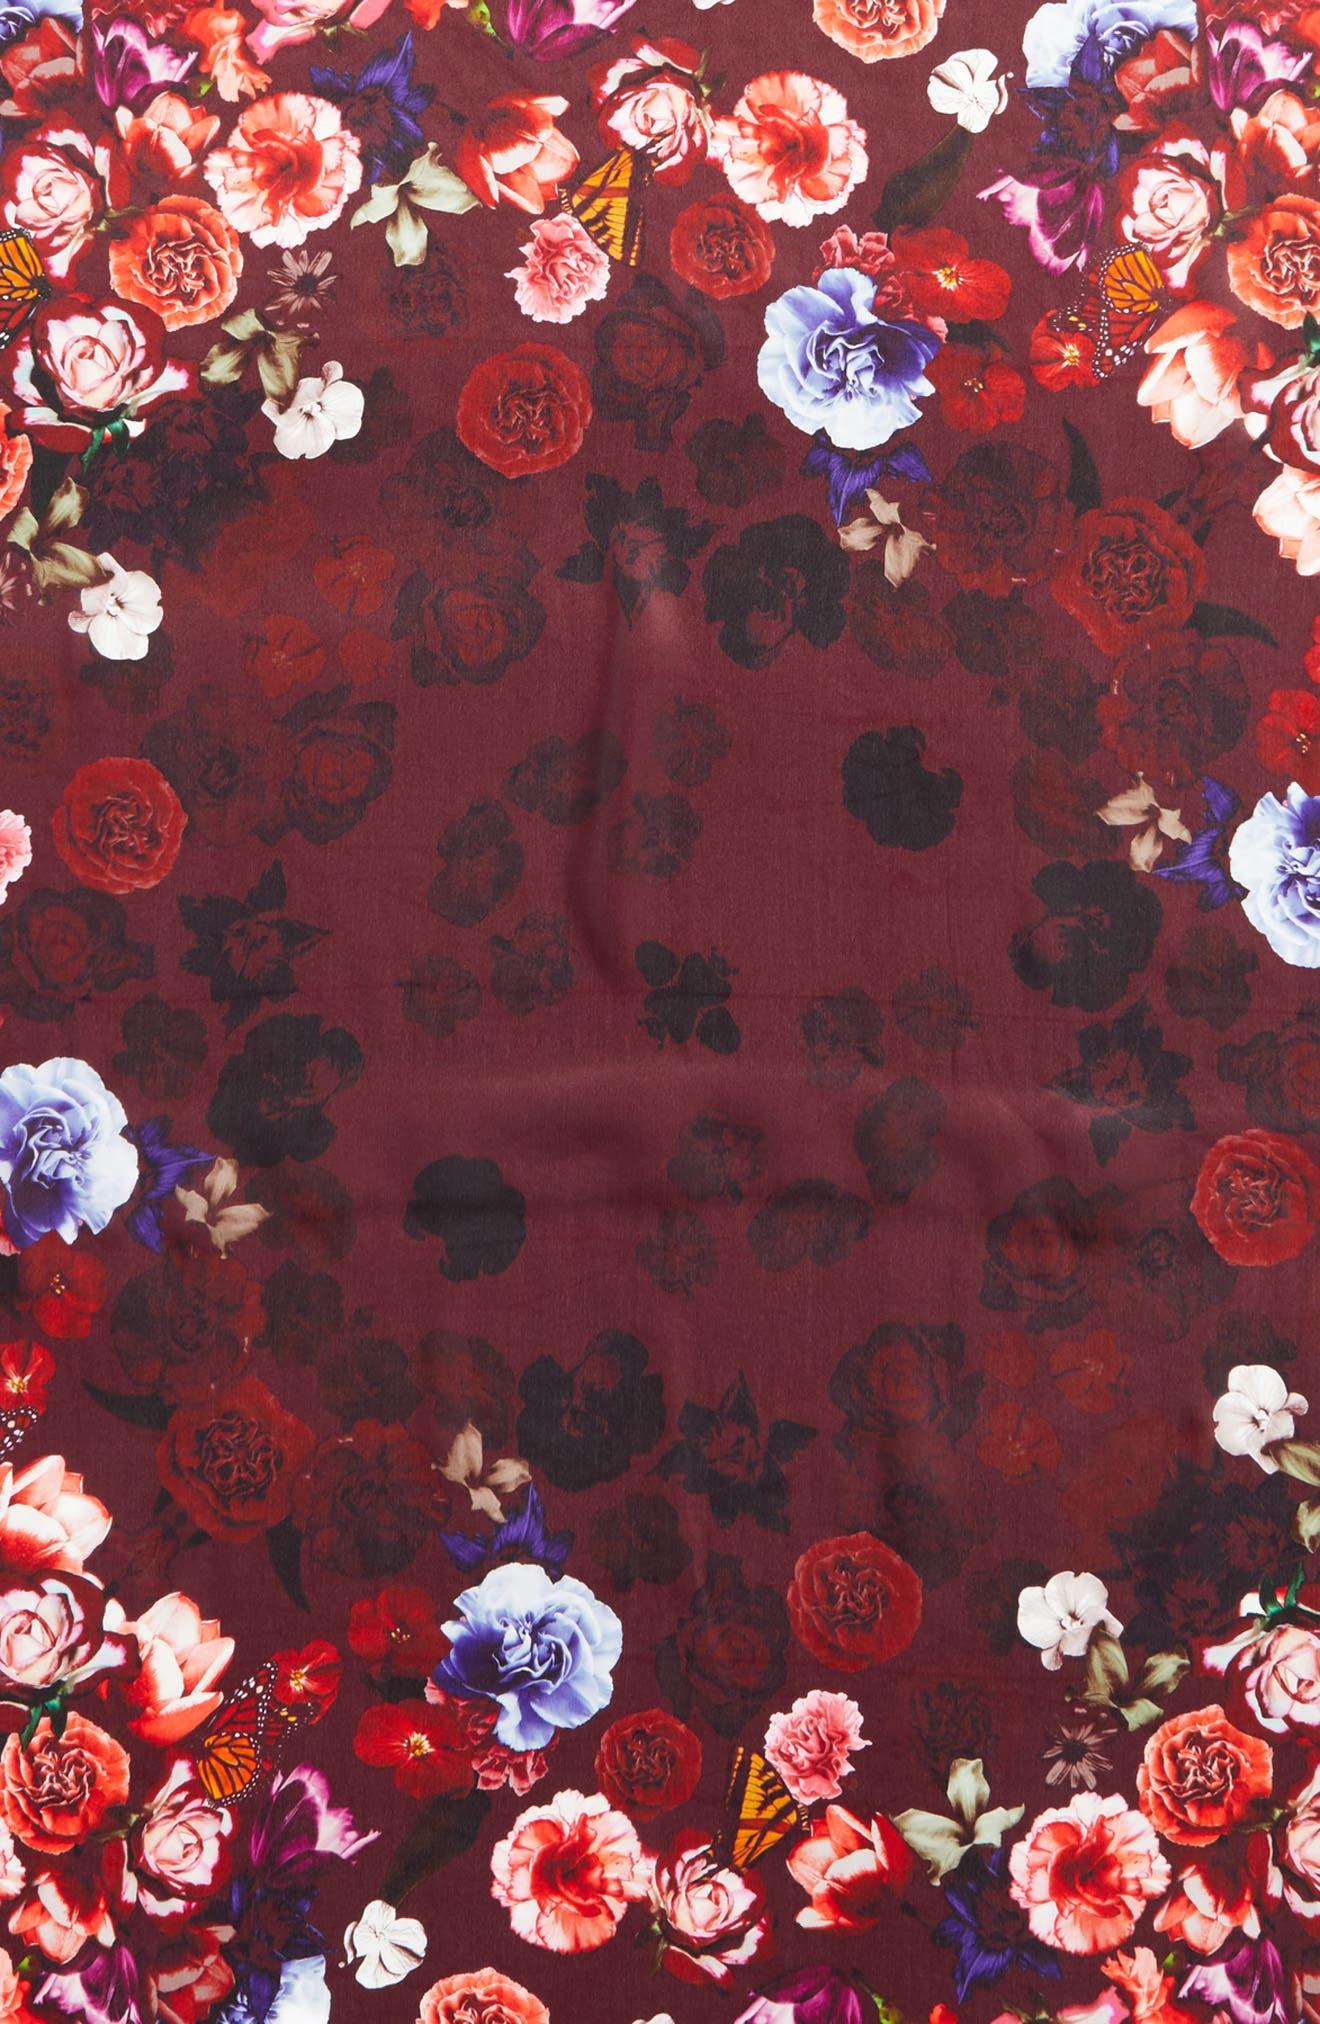 Floral Gem Square Silk Scarf,                             Alternate thumbnail 4, color,                             001